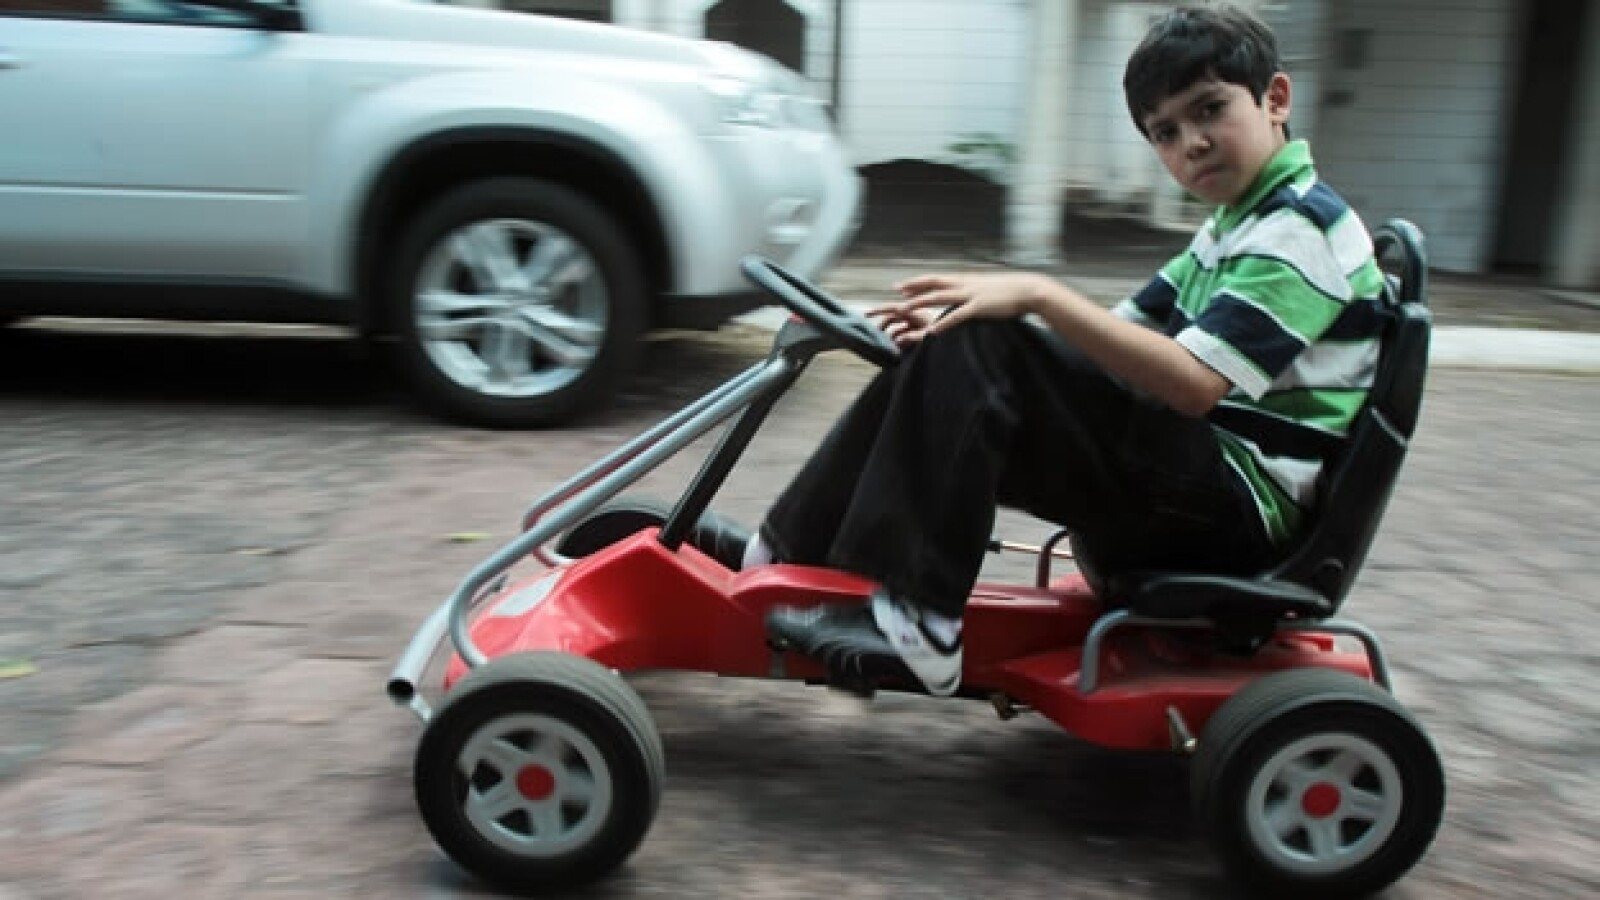 Luis Roberto Ramirez Alvarez en un carrito